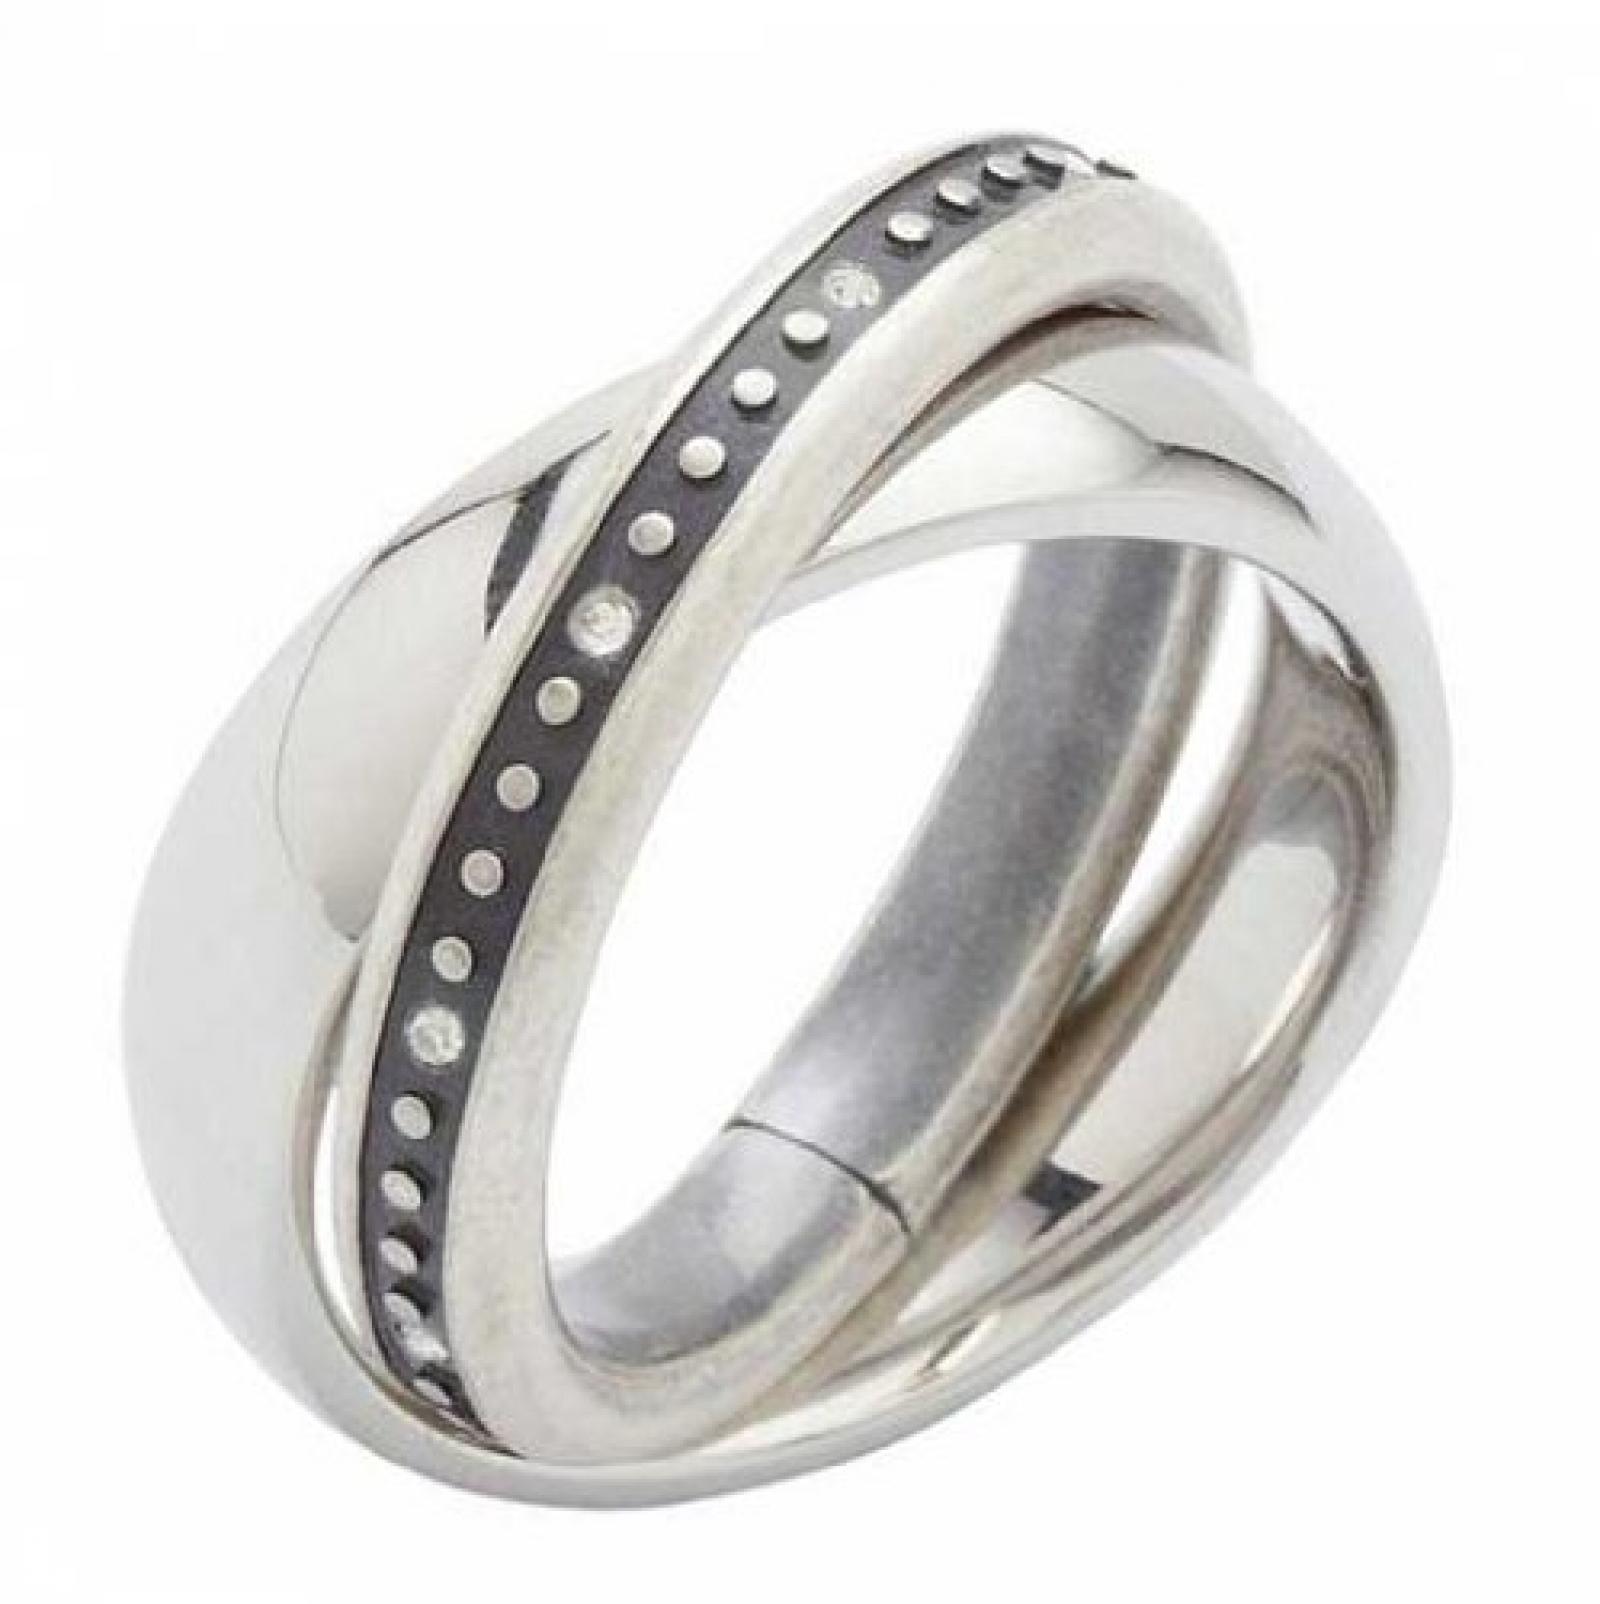 Fossil Jewelry Damen Ring JF84715 Gr. 18/57 Edelstahl NEU 4897